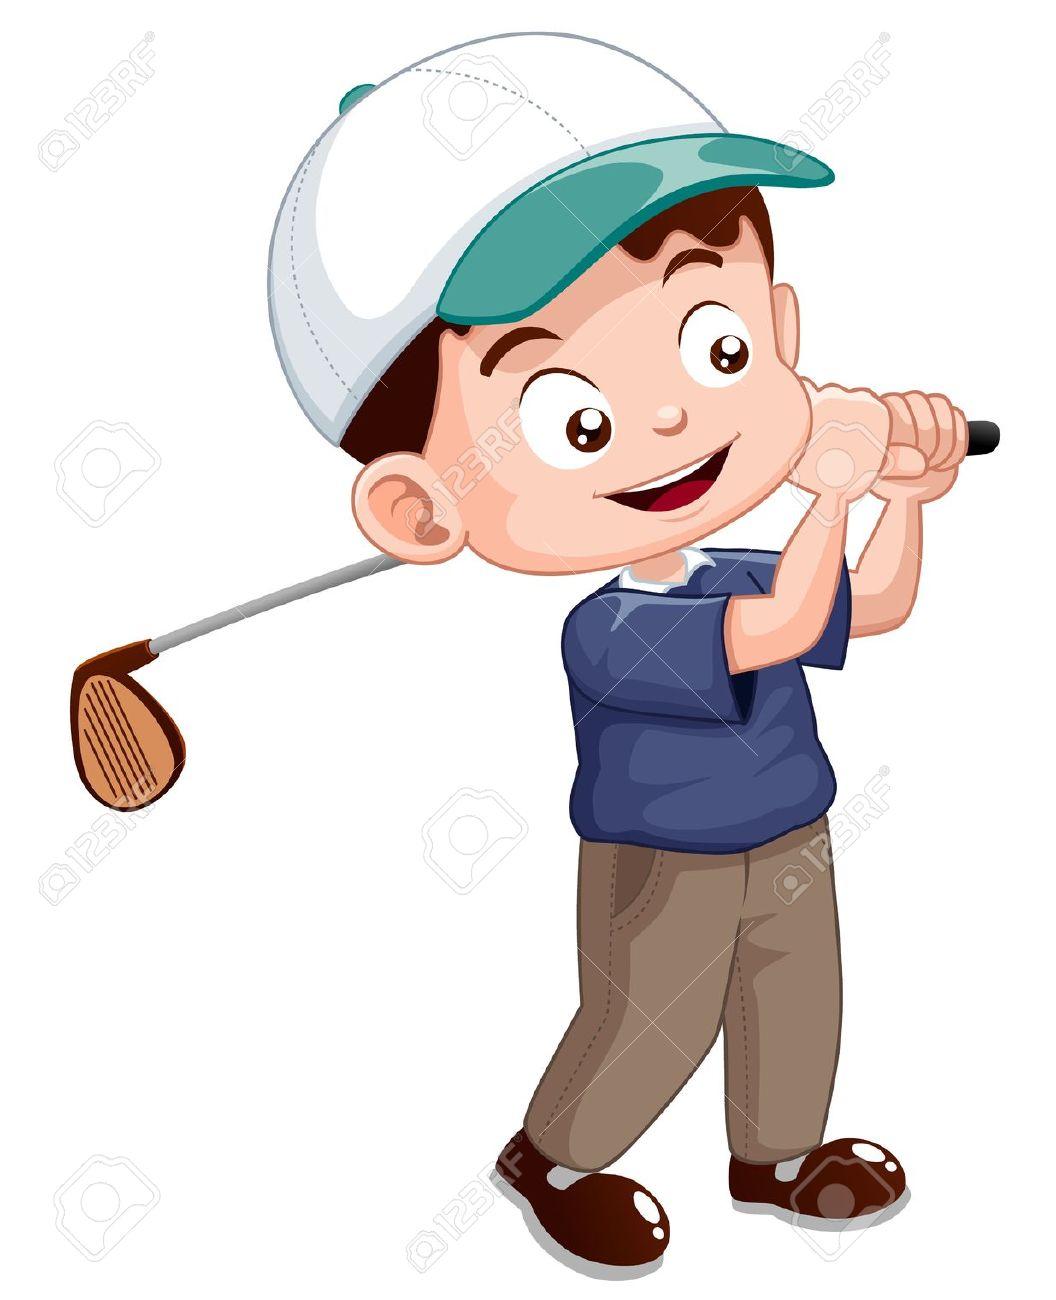 Golf player clipart - Clipground Kid Golfer Clipart